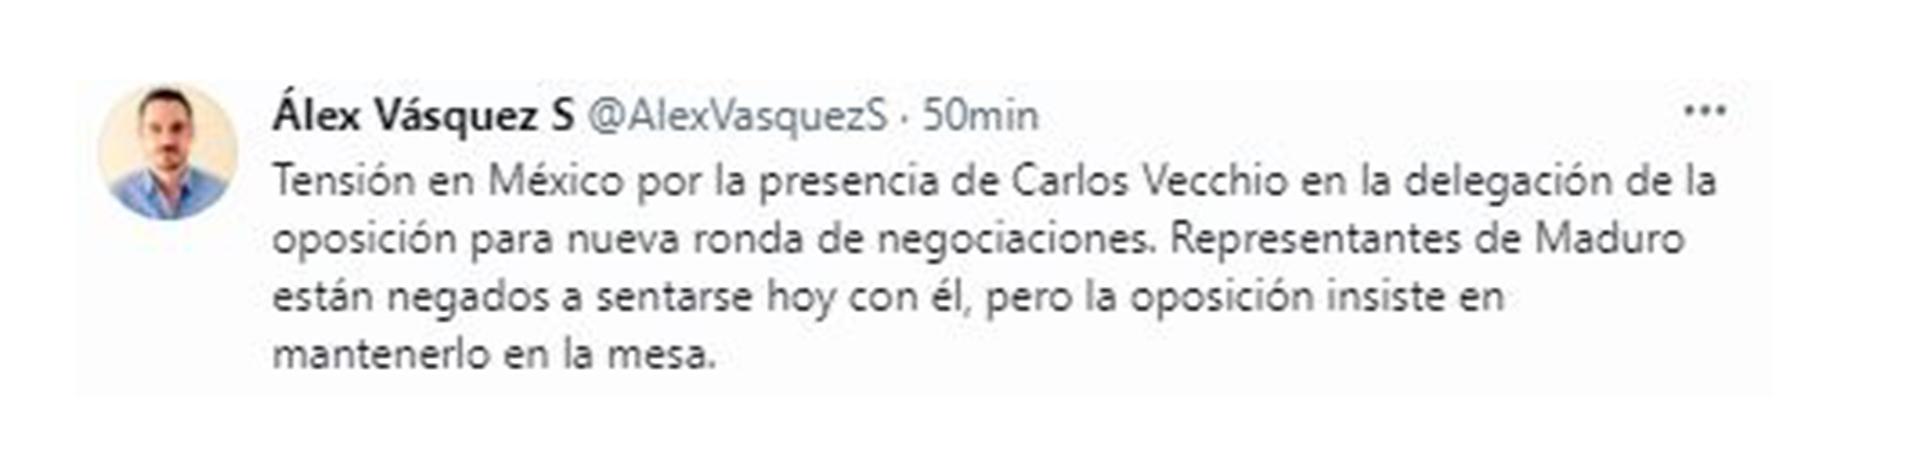 Alex Vasquez's tweet